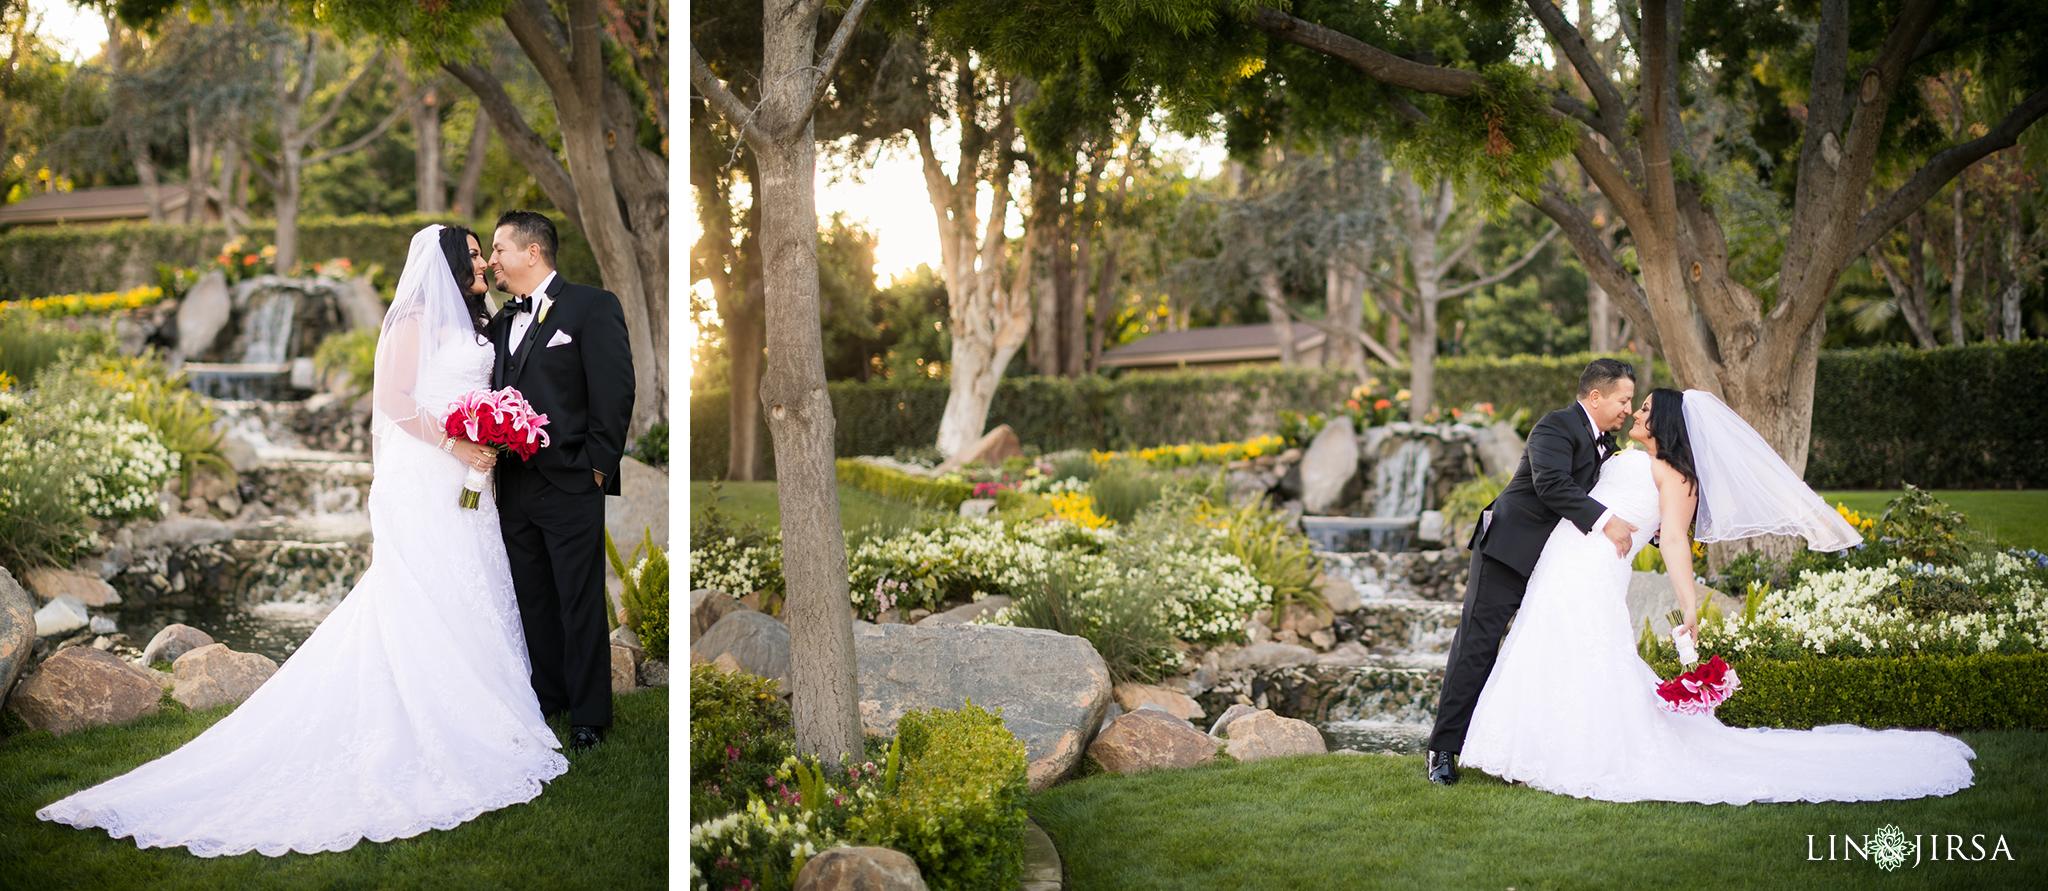 17-grand-tradition-estate-fallbrook-wedding-photography